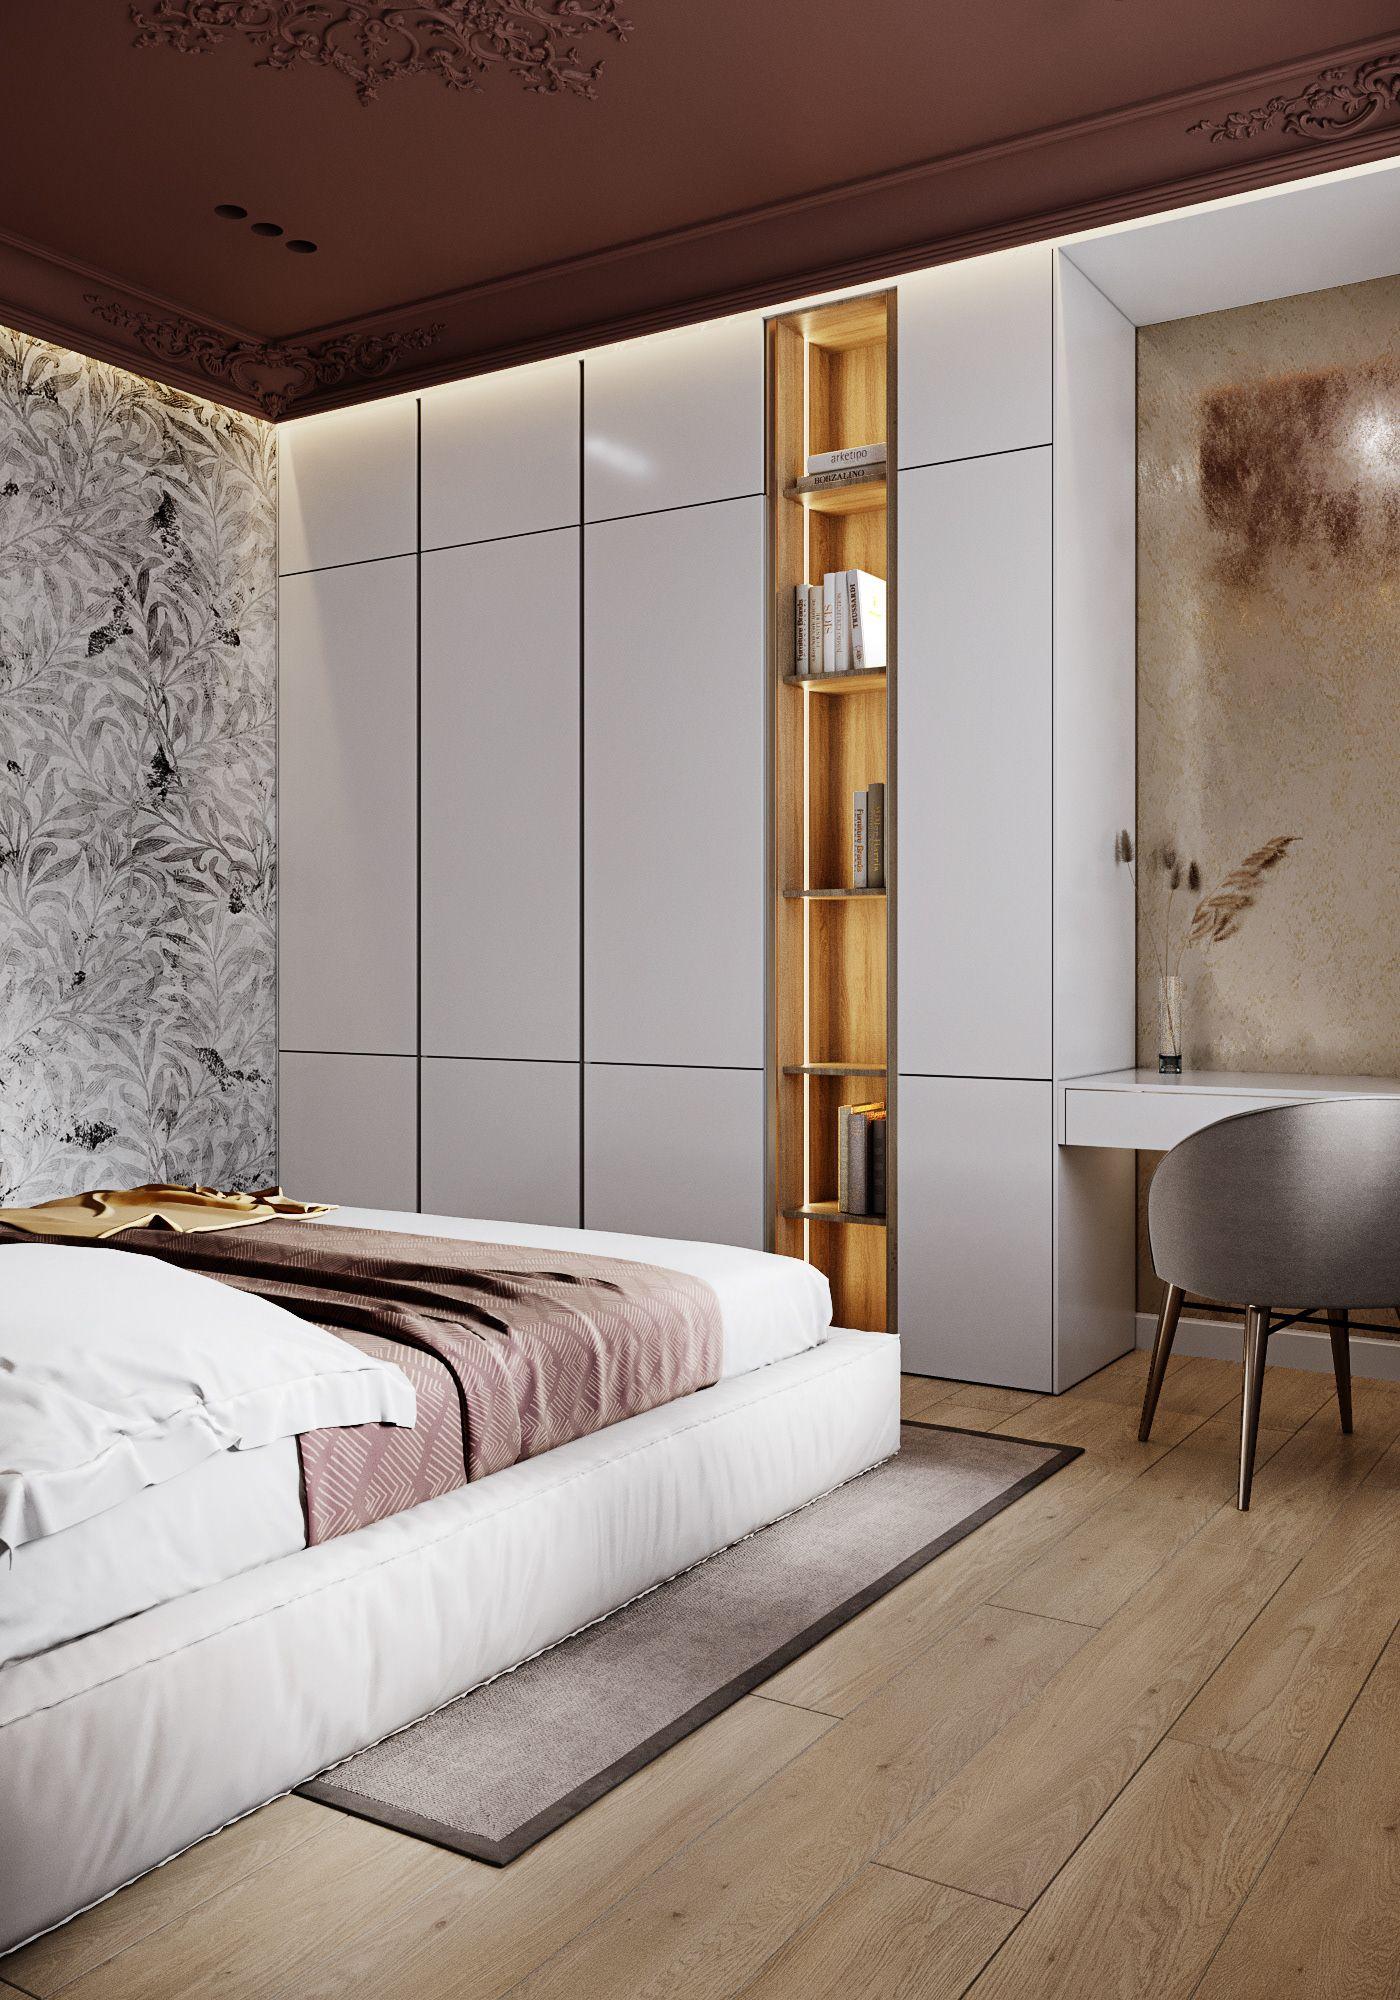 Image May Contain Indoor Furniture And Wall In 2021 Interior Design Bedroom Wardrobe Interior Design Bad Room Design Bedroom bad design 2021